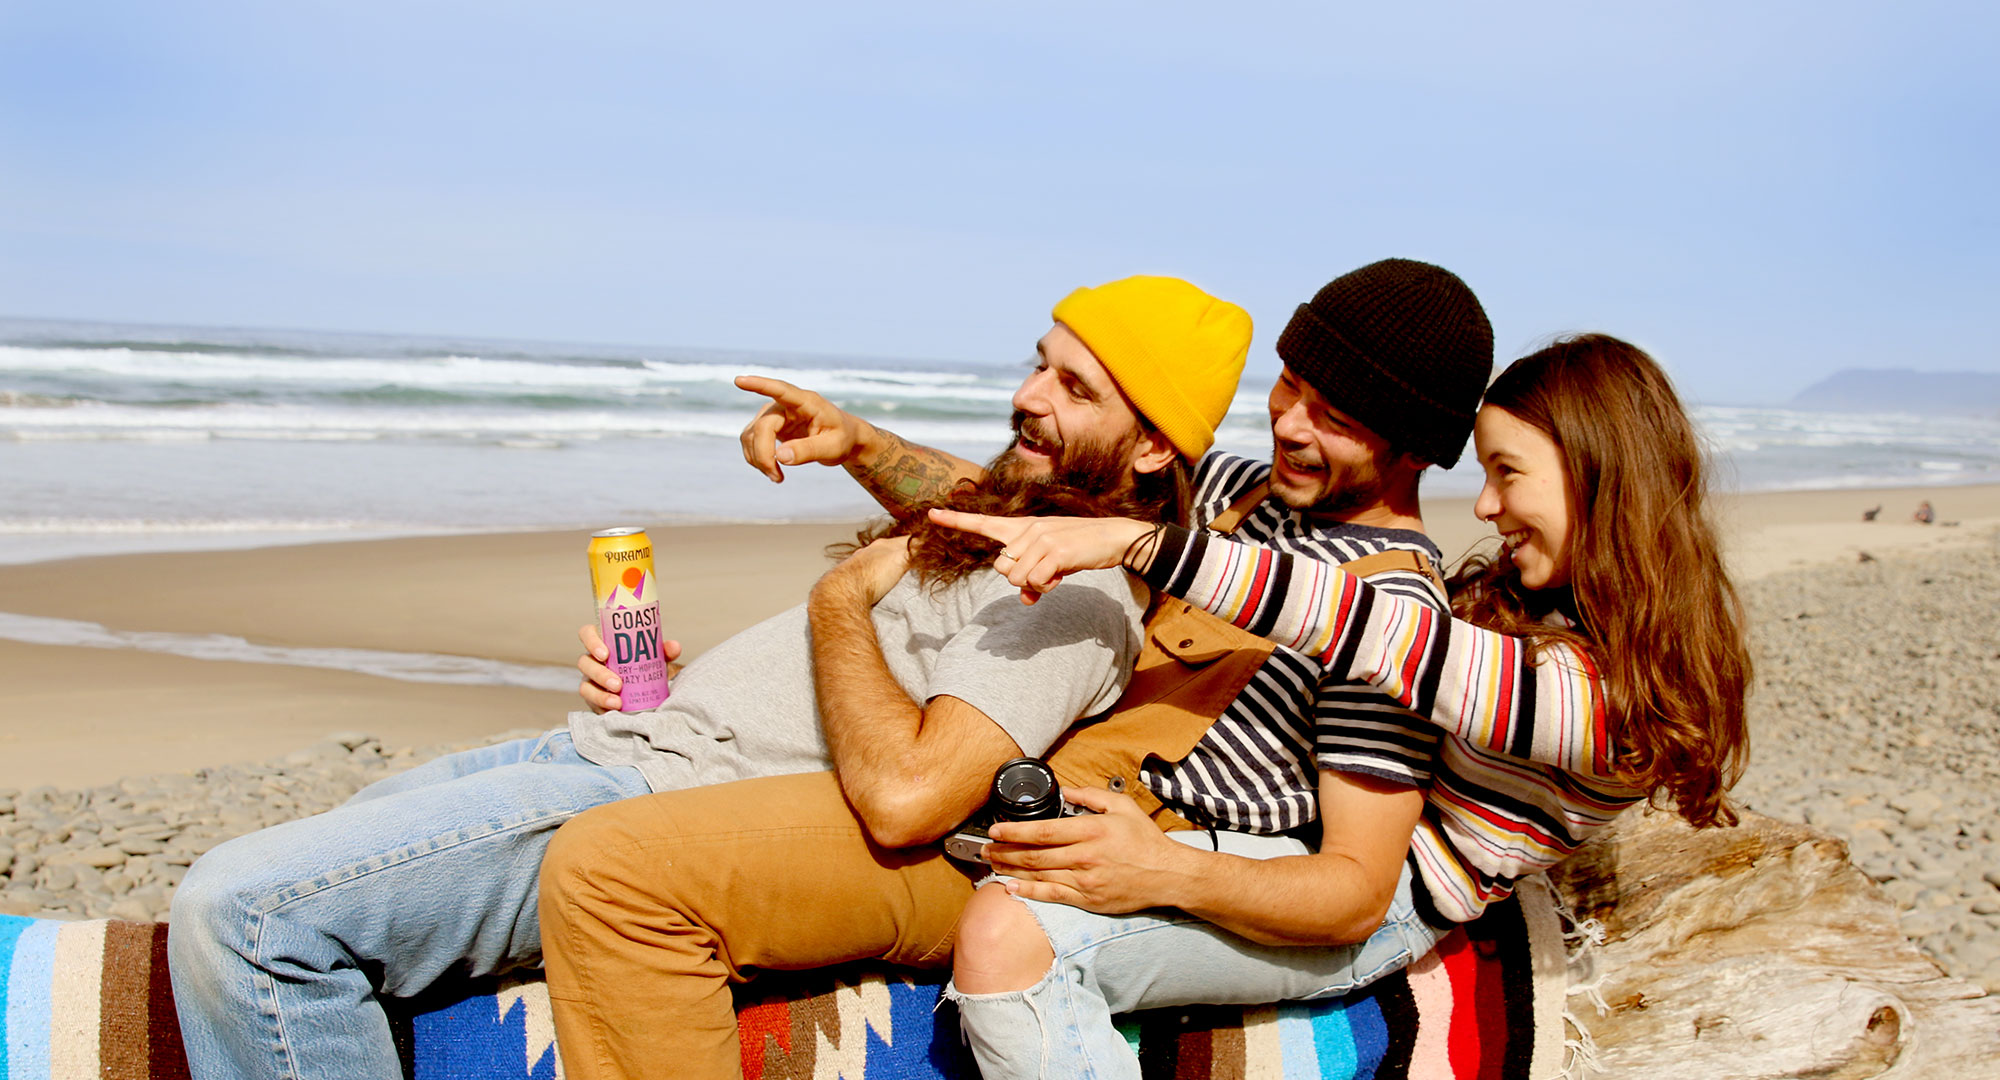 Three friends on a log at the beach